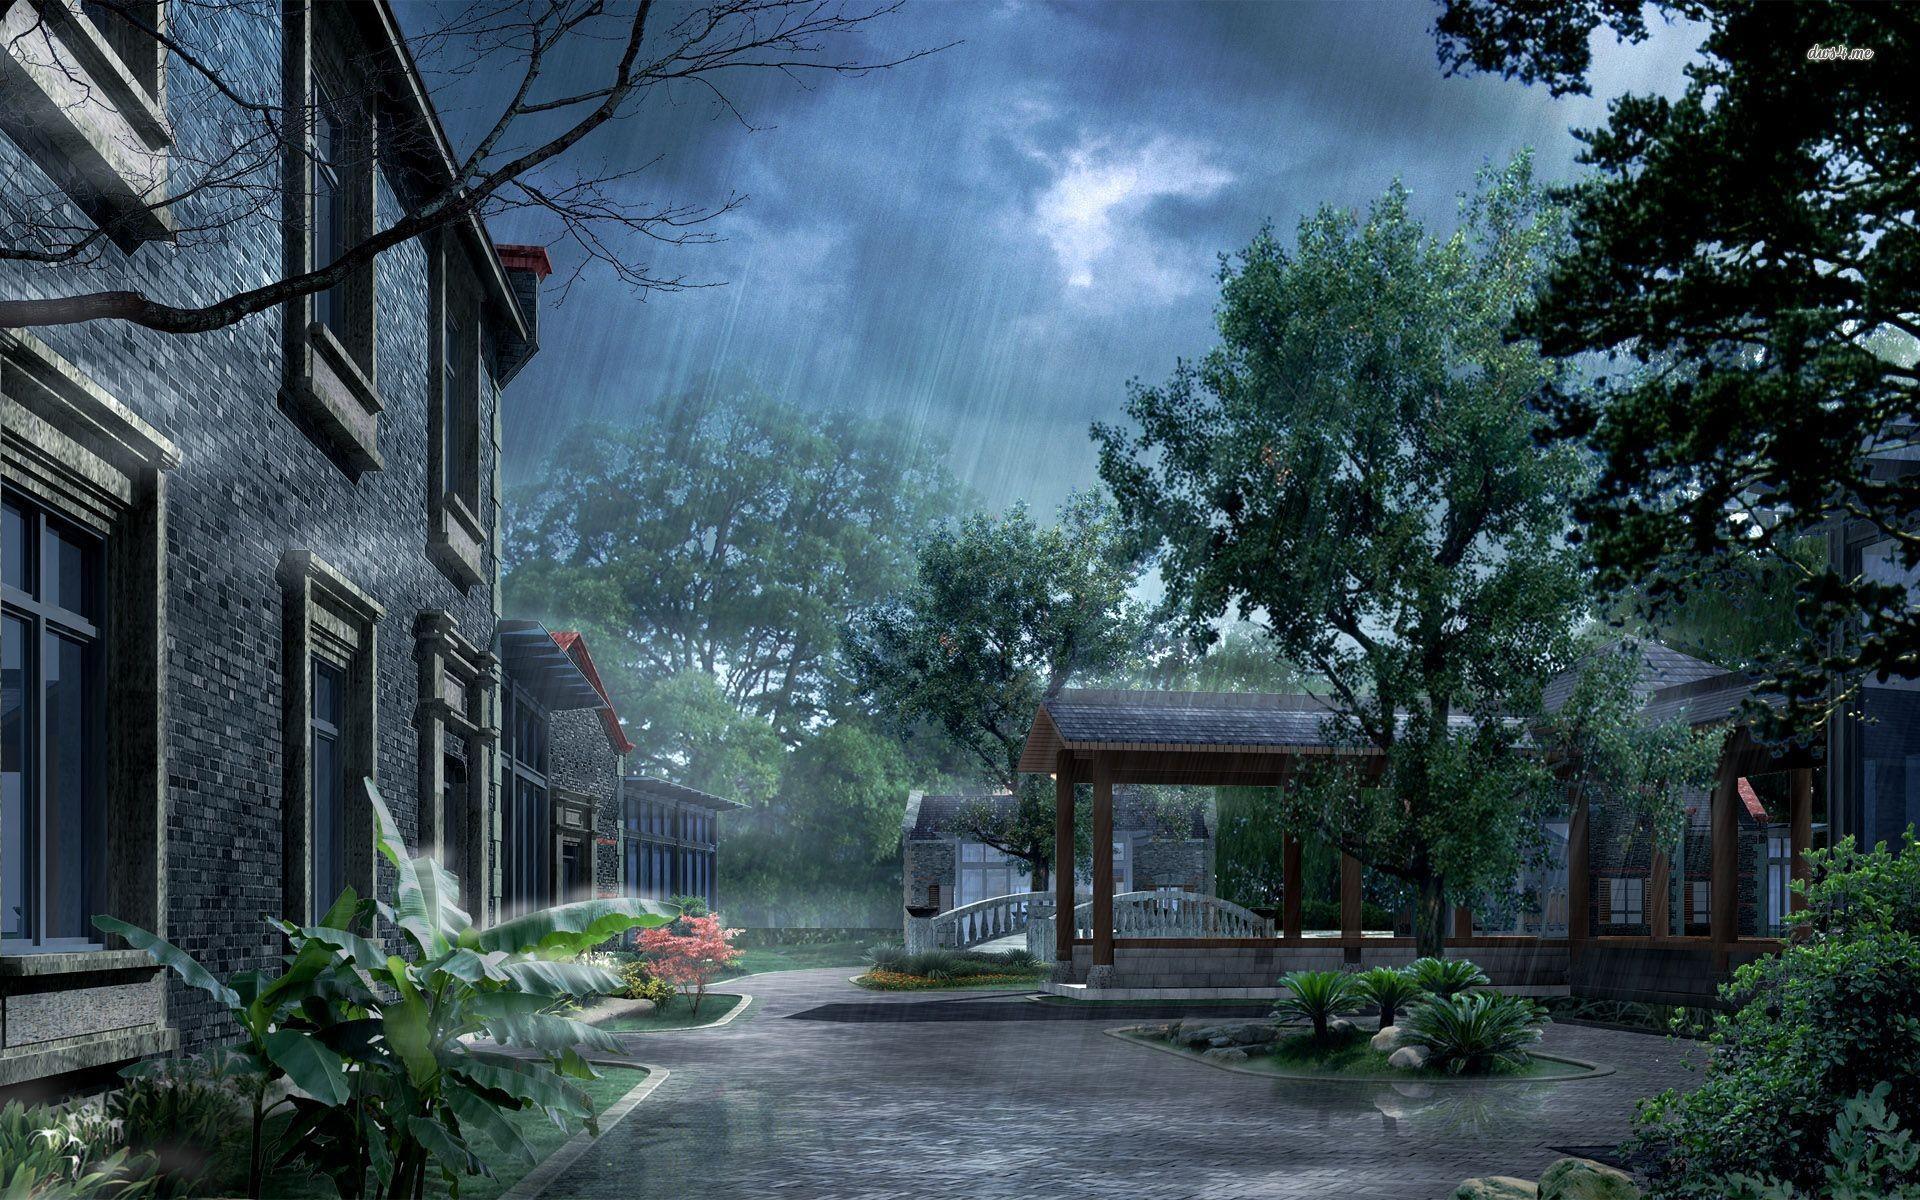 Rain Wallpaper 70 Pictures